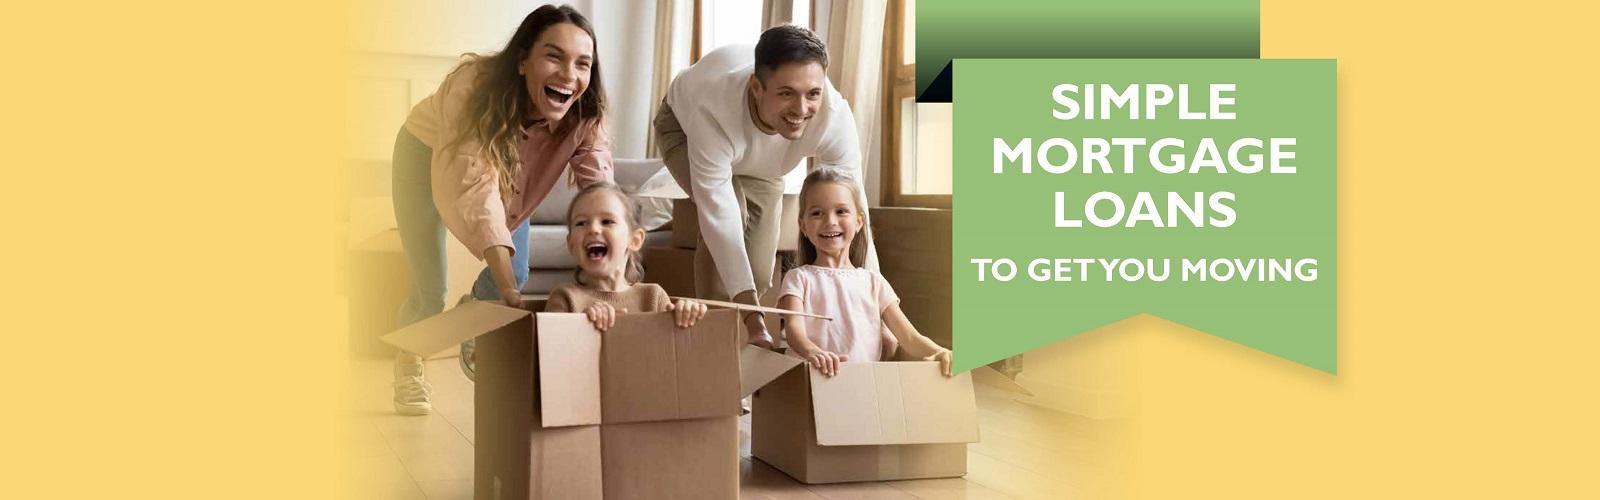 Simple Mortgage Loans